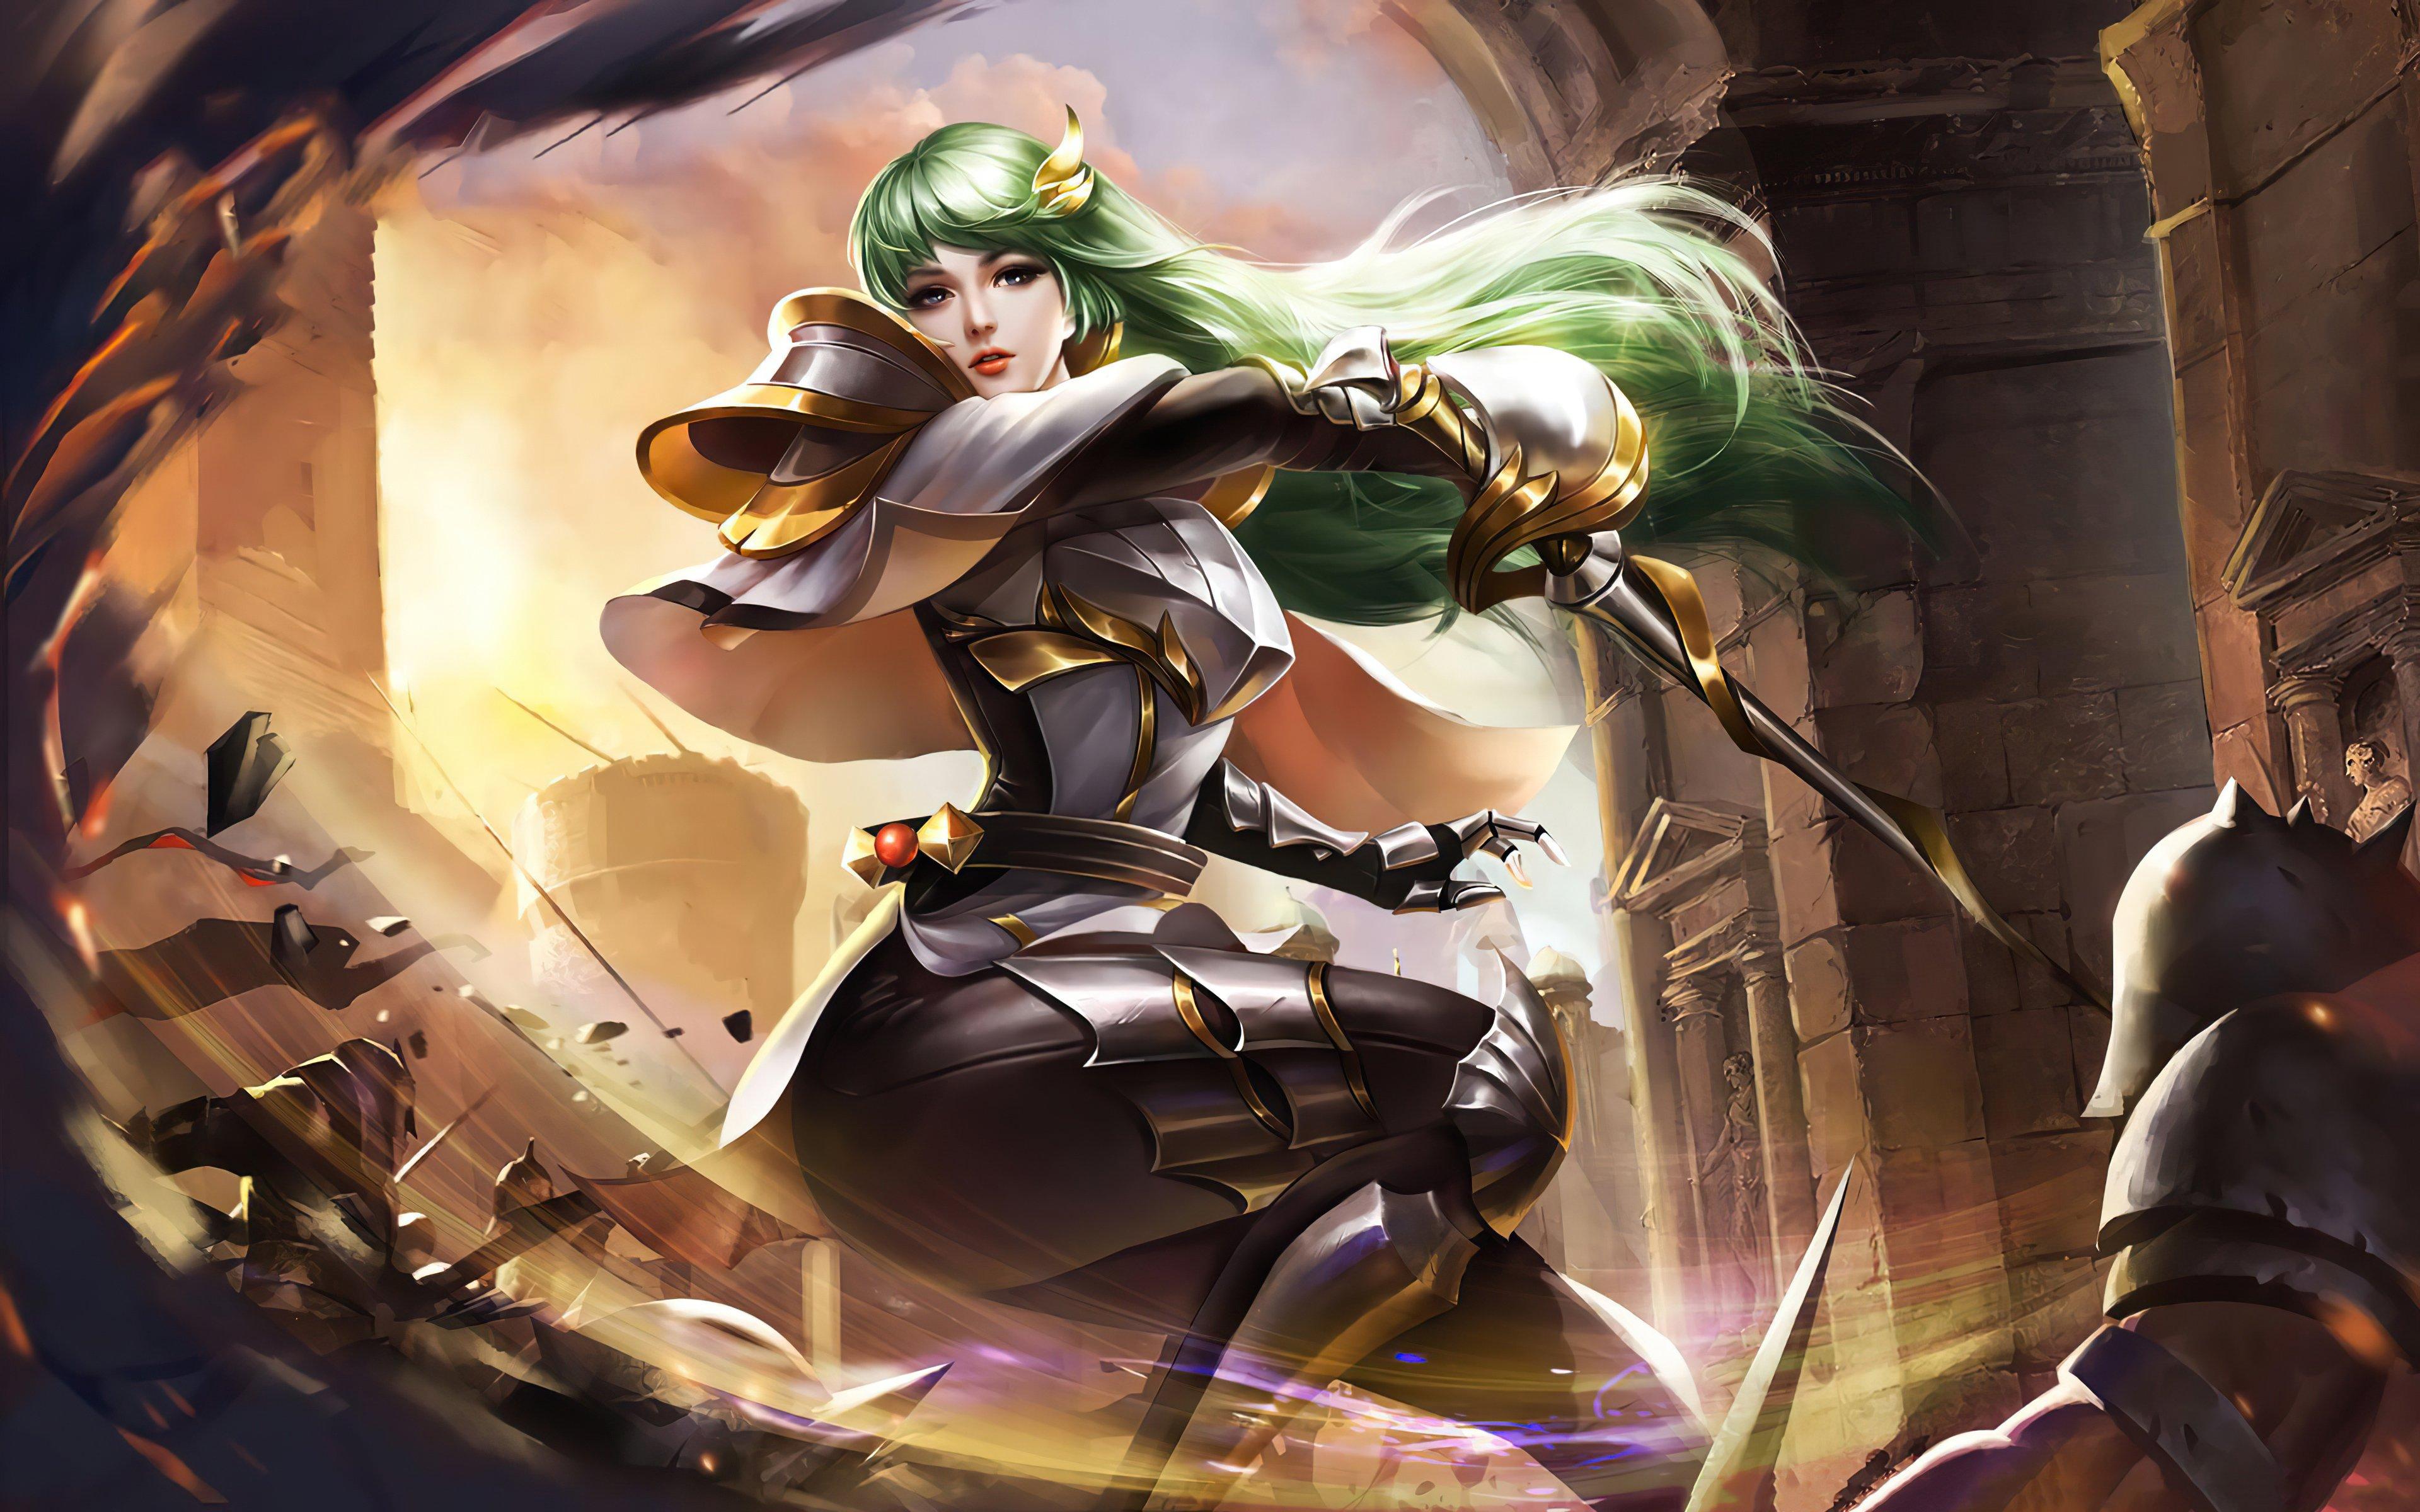 Wallpaper Mulan Heroes Evolved